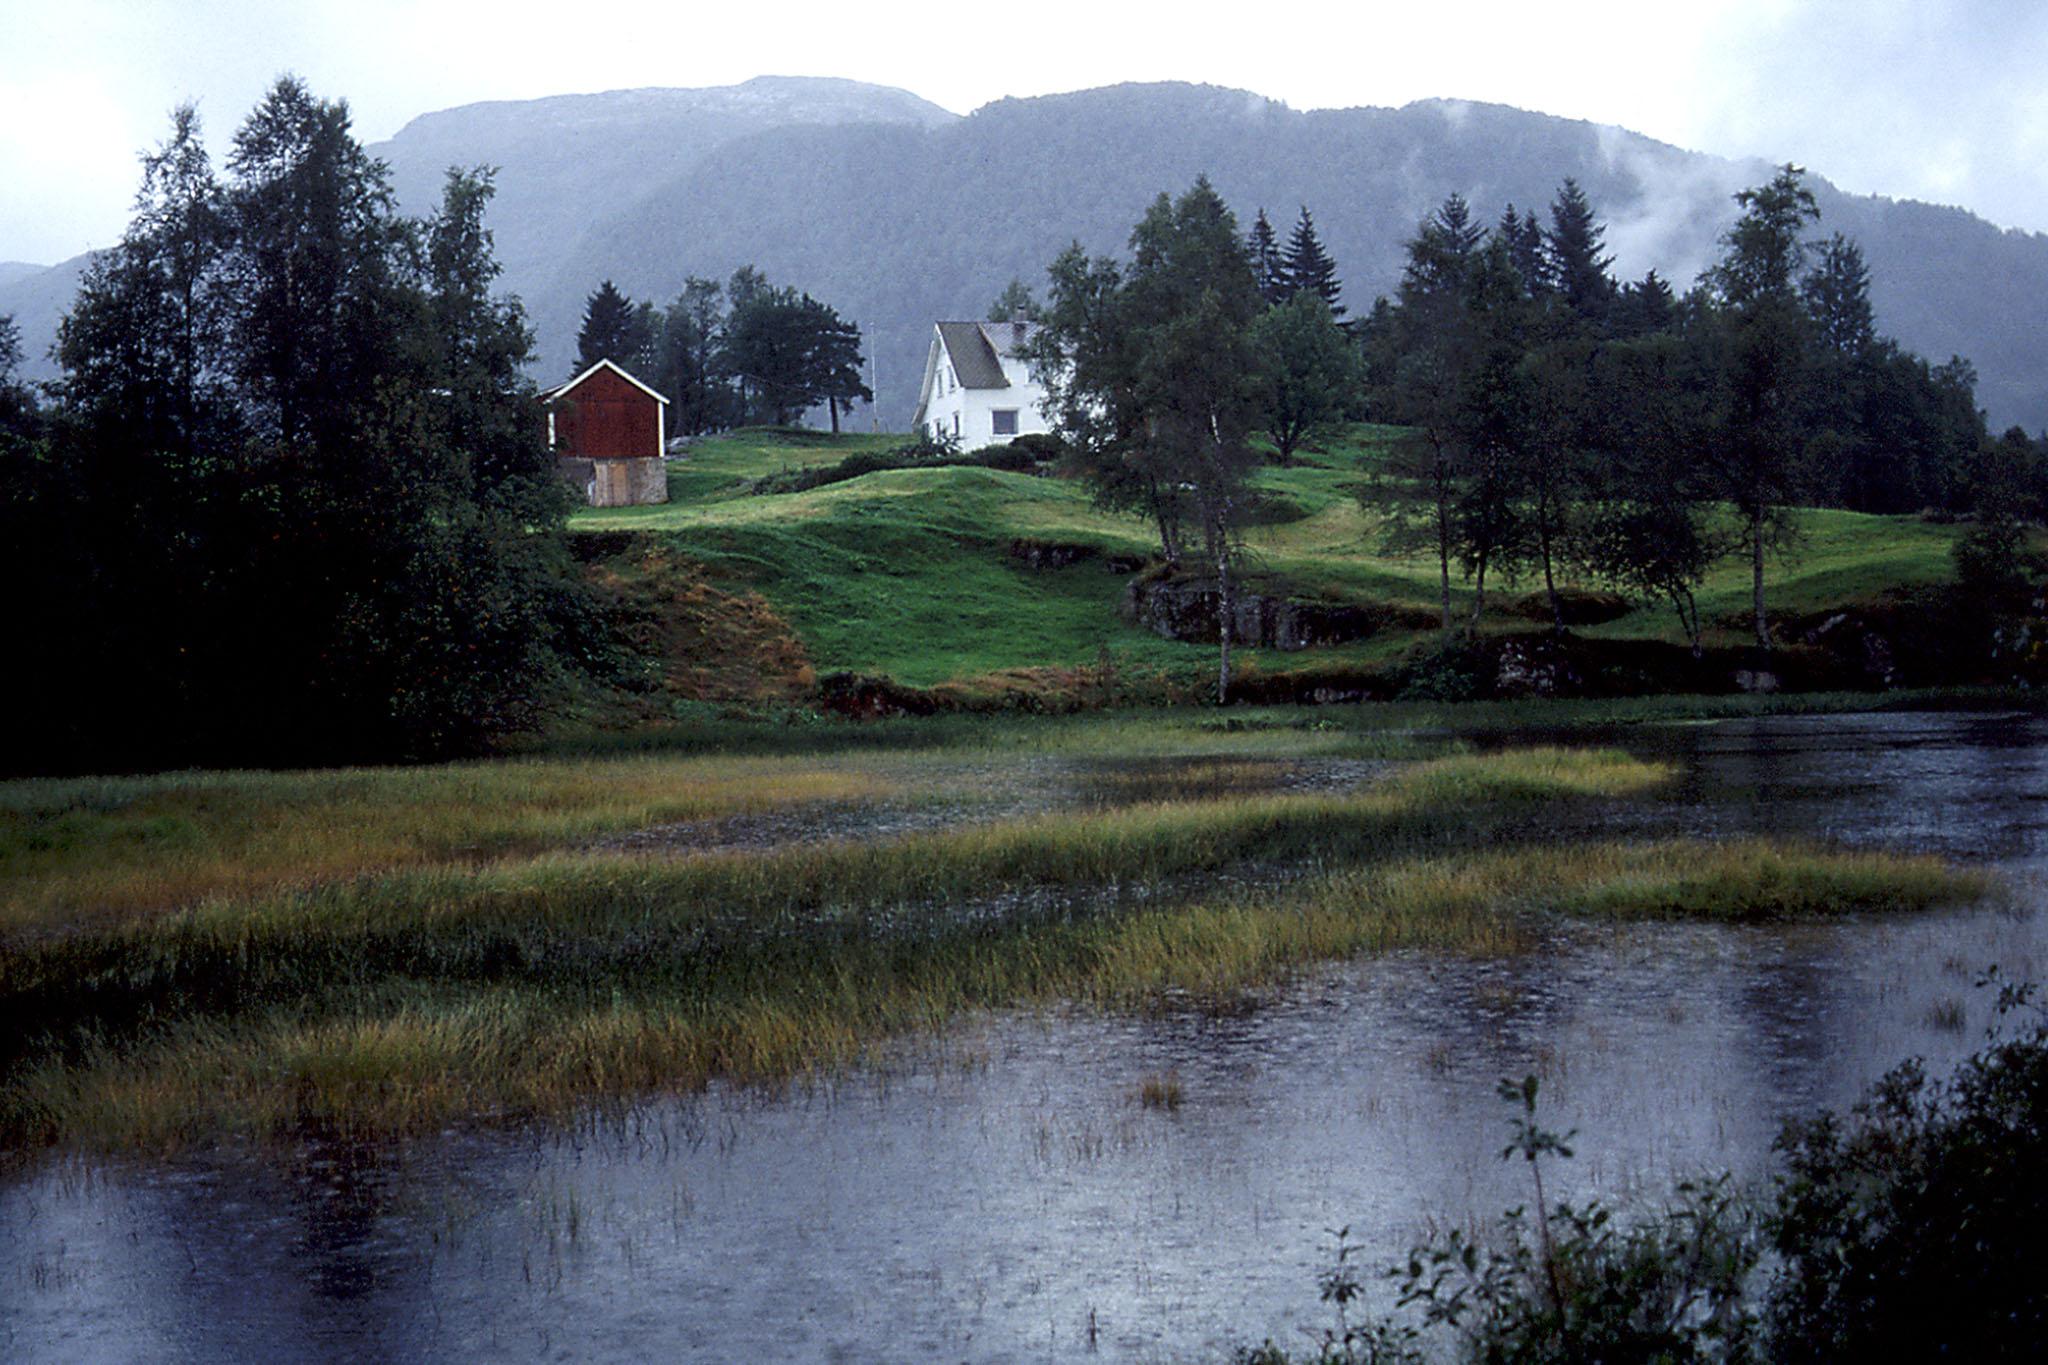 A rainy day - Sauda, Norway